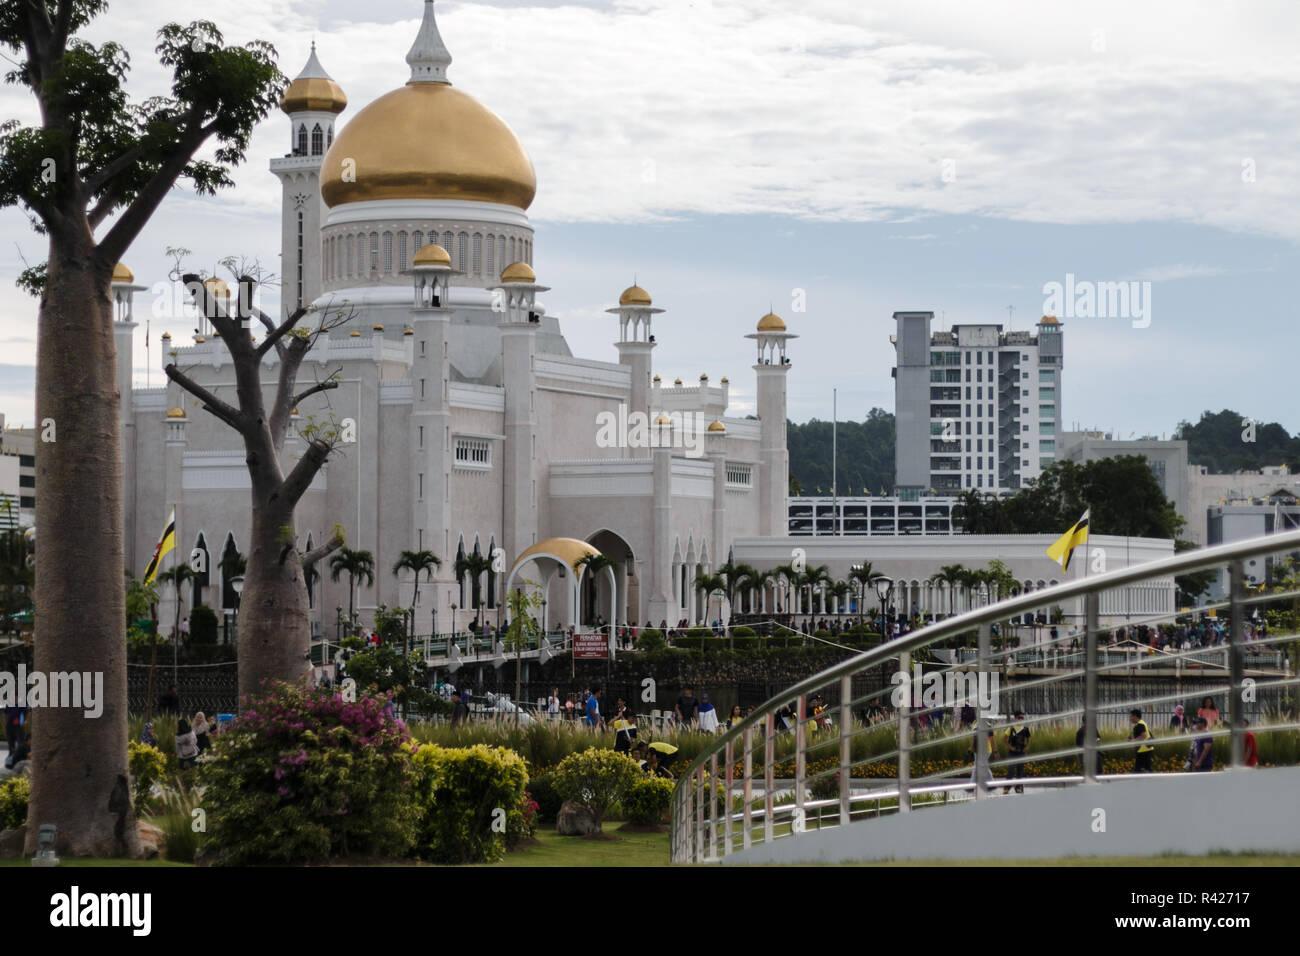 Brunei Darussalam SOAS Mosque - Stock Image